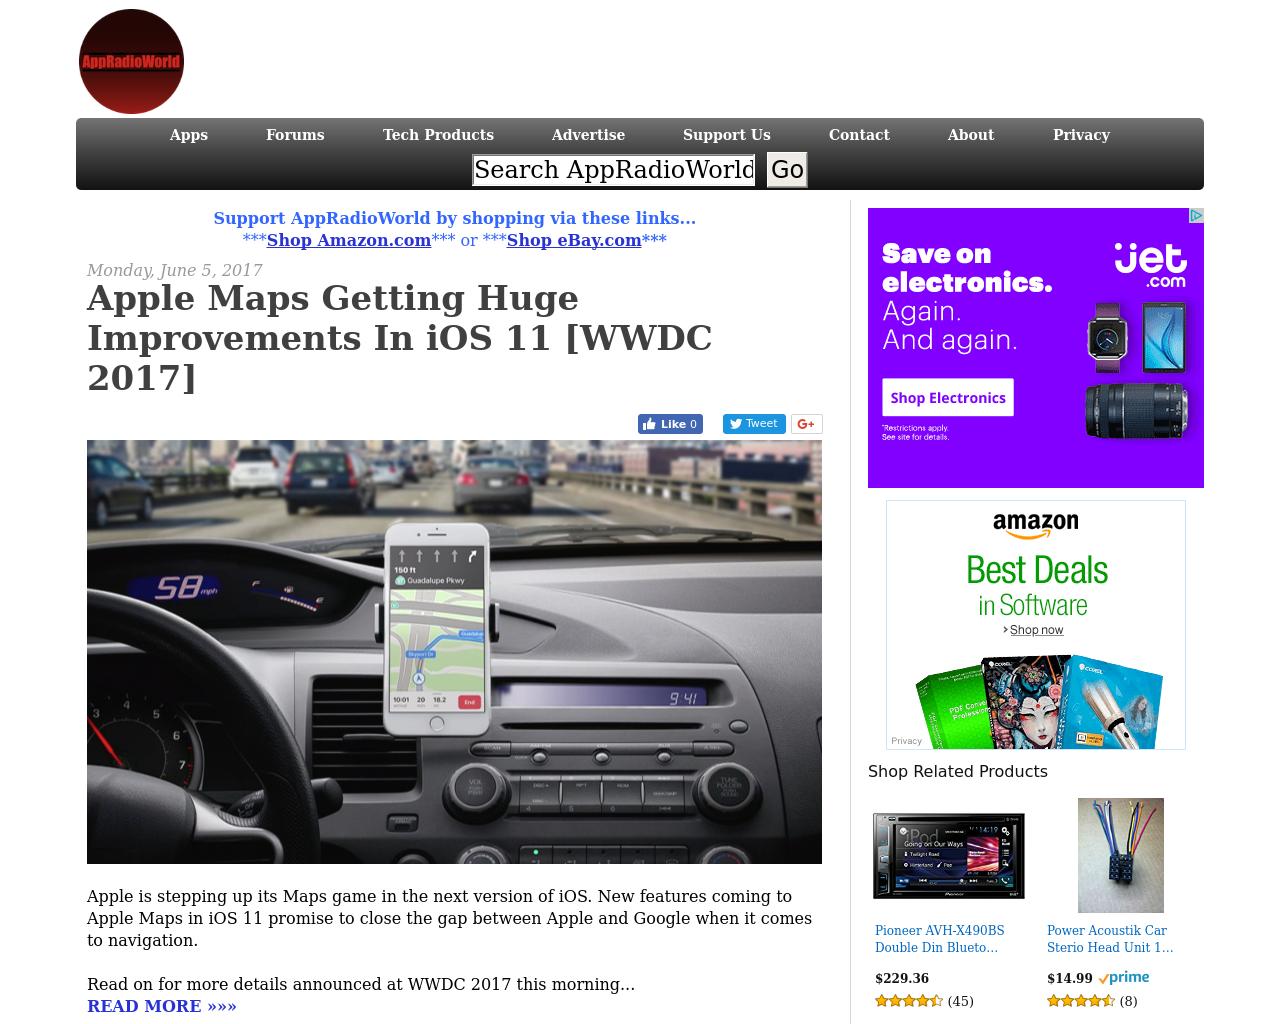 AppRadioWorld-Advertising-Reviews-Pricing